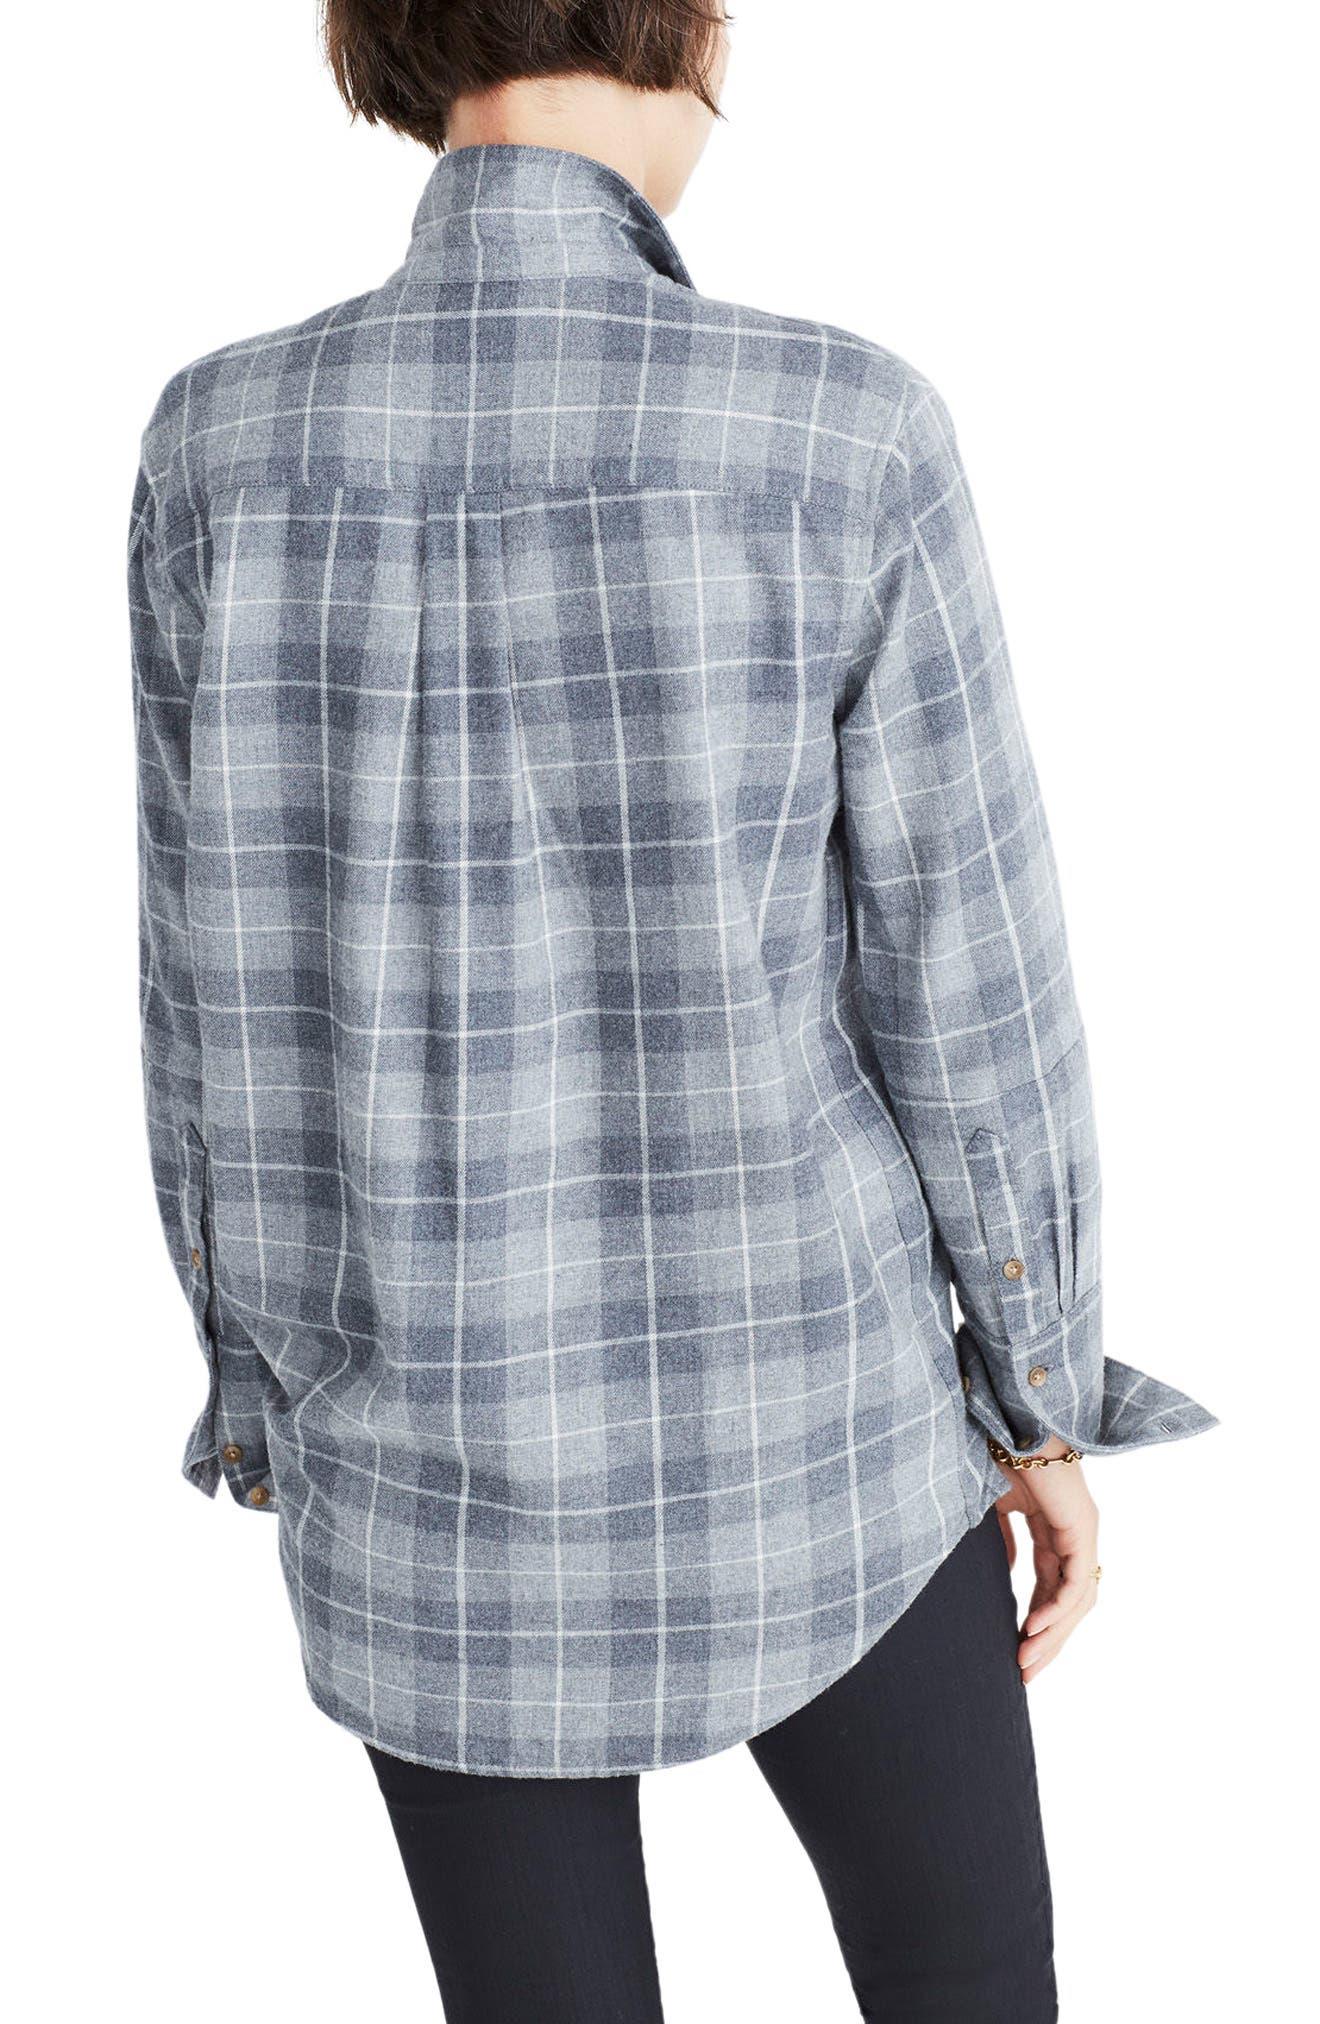 Bristol Plaid Flannel Shirt,                             Alternate thumbnail 2, color,                             Steel Morning